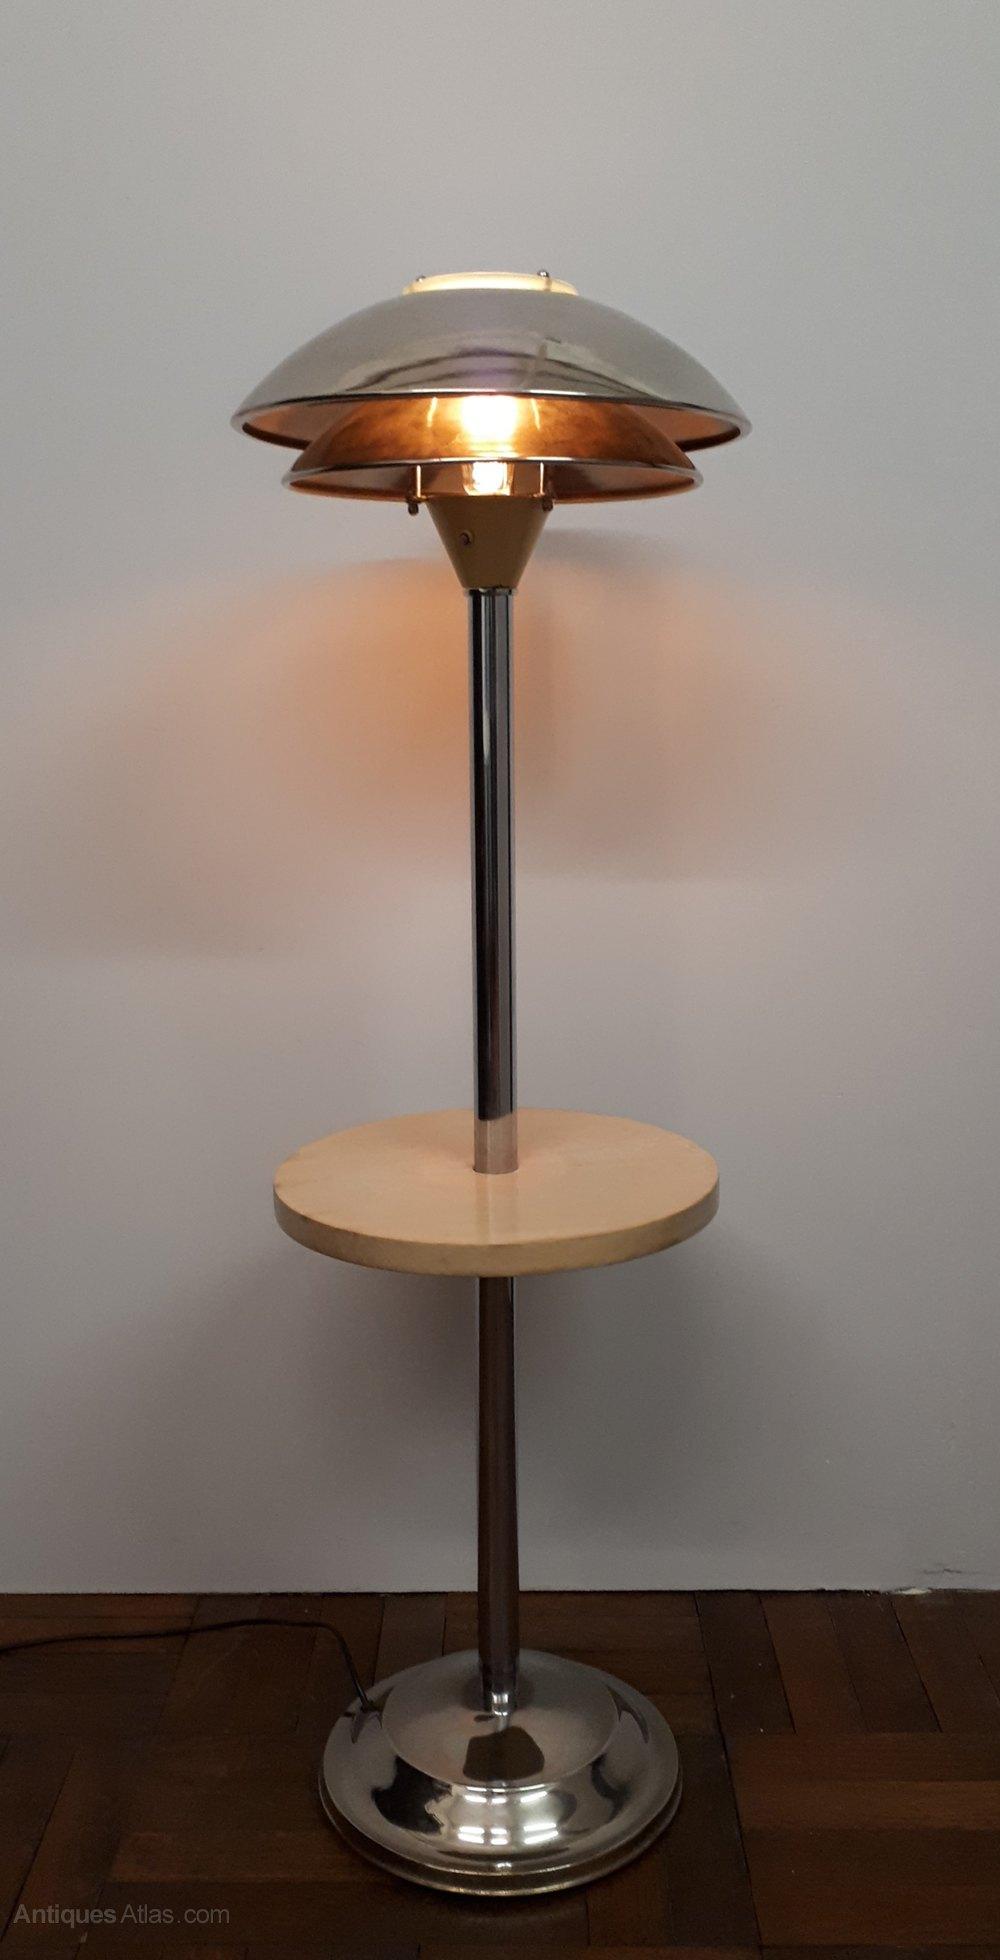 Antiques Atlas Art Deco Floor Lamp